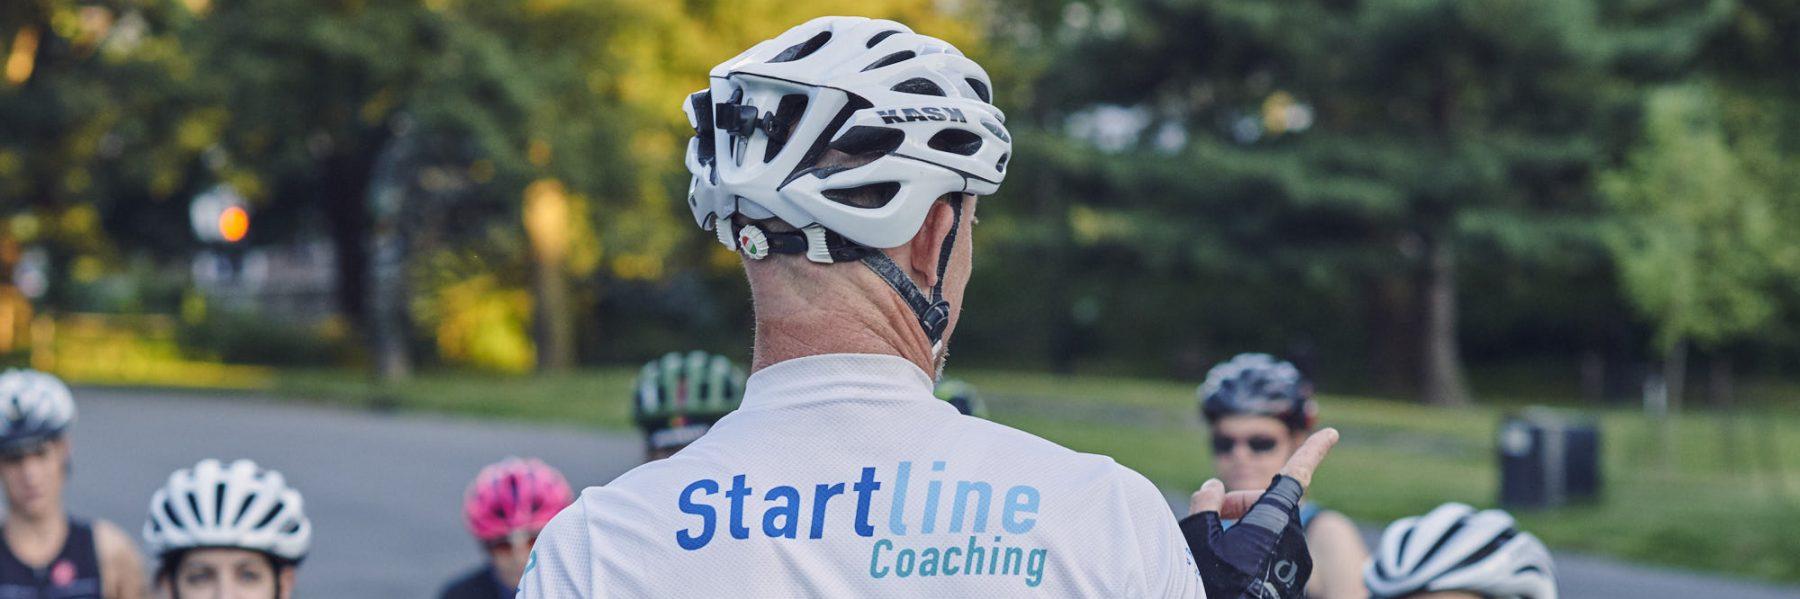 Startline Coaching